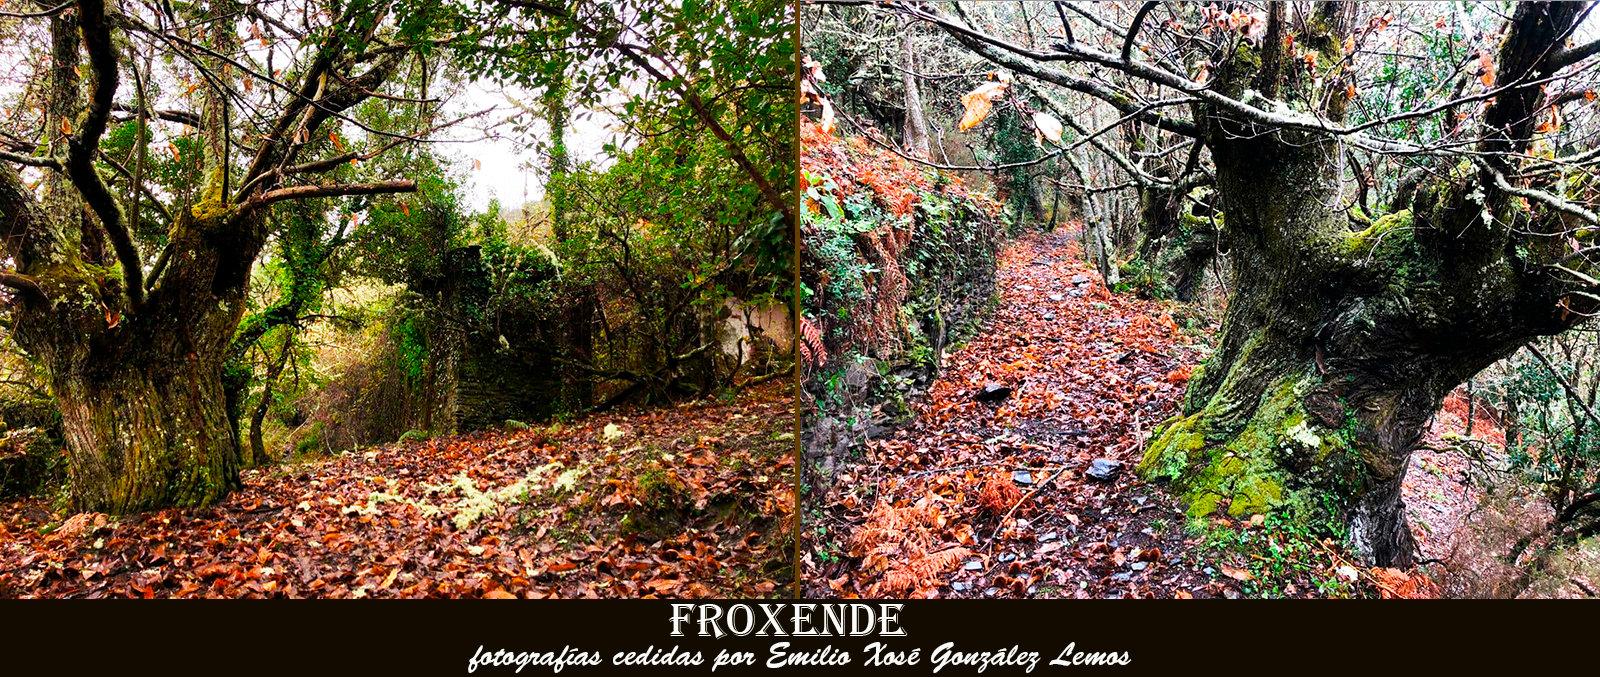 Froxende1-WEB.jpg